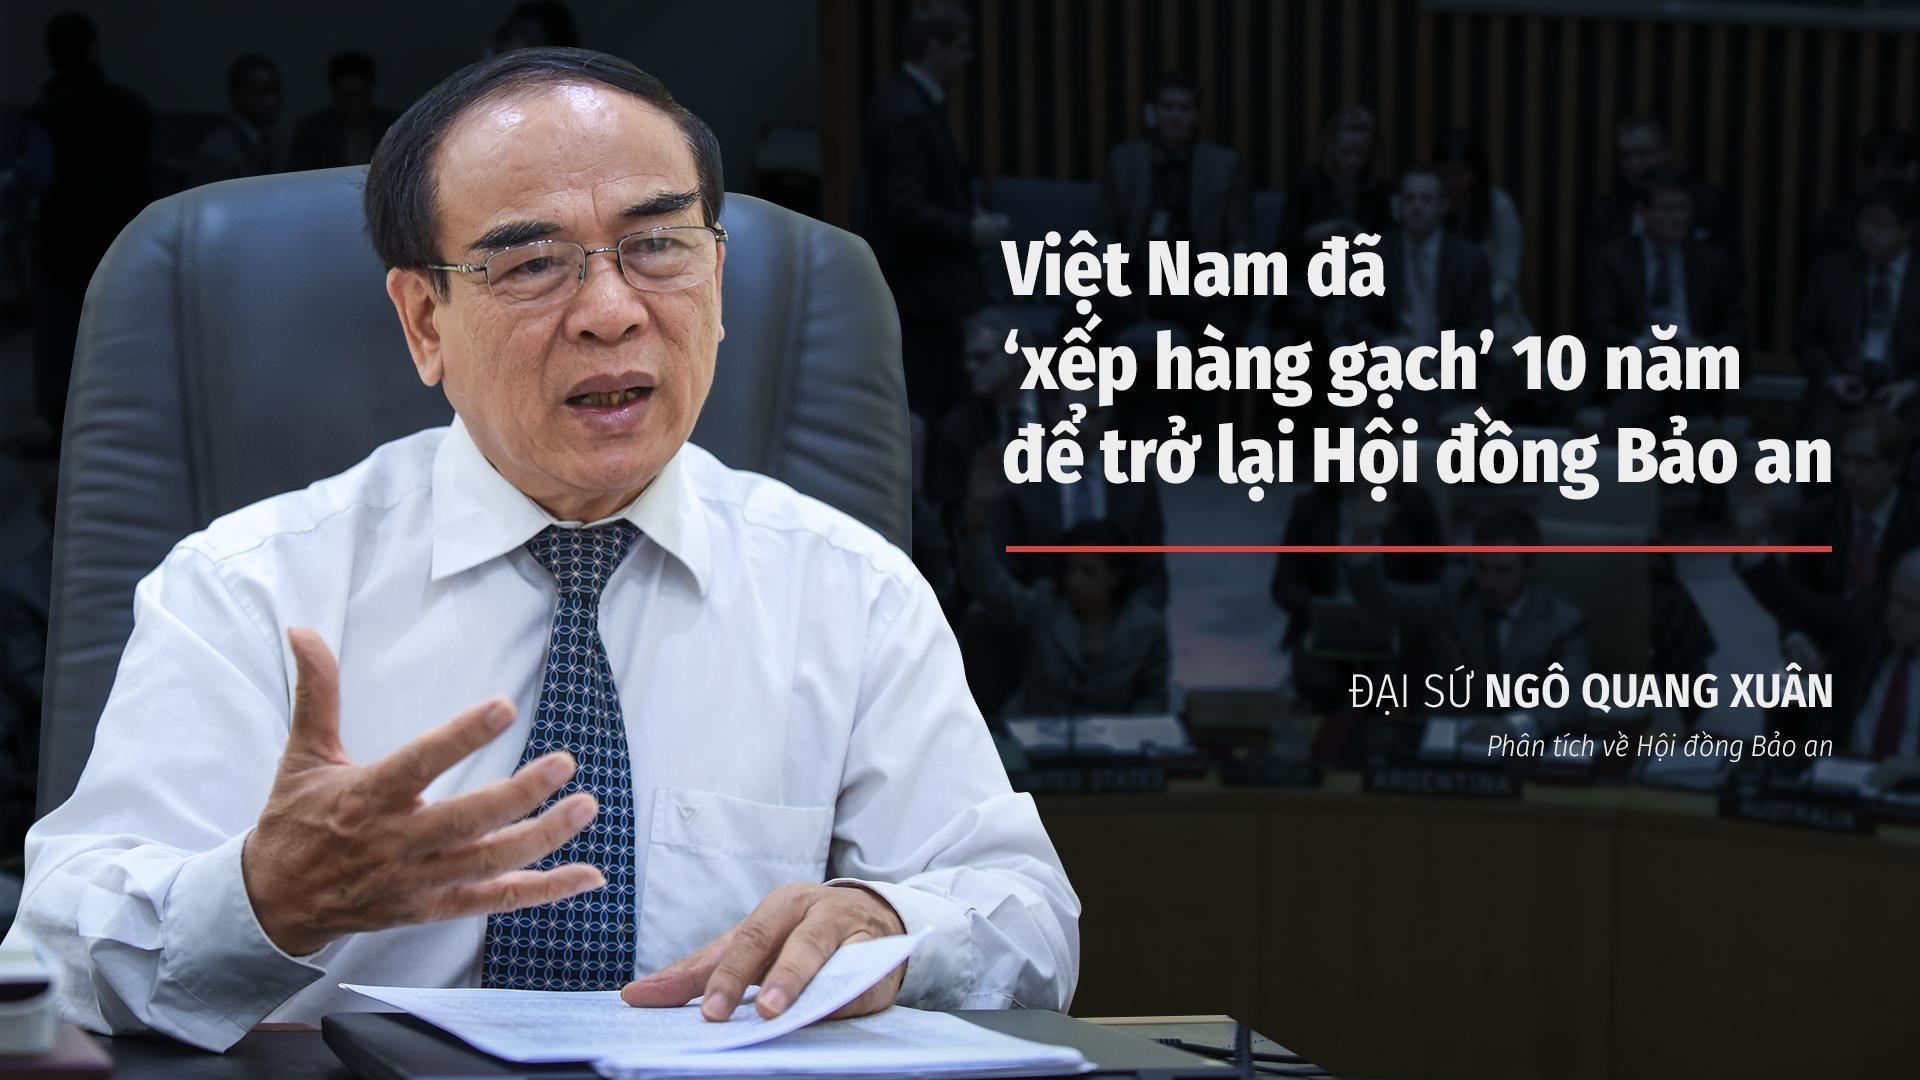 DS Ngo Quang Xuan: VN da van dong 10 nam de co ngay vao HDBA hom nay hinh anh 2